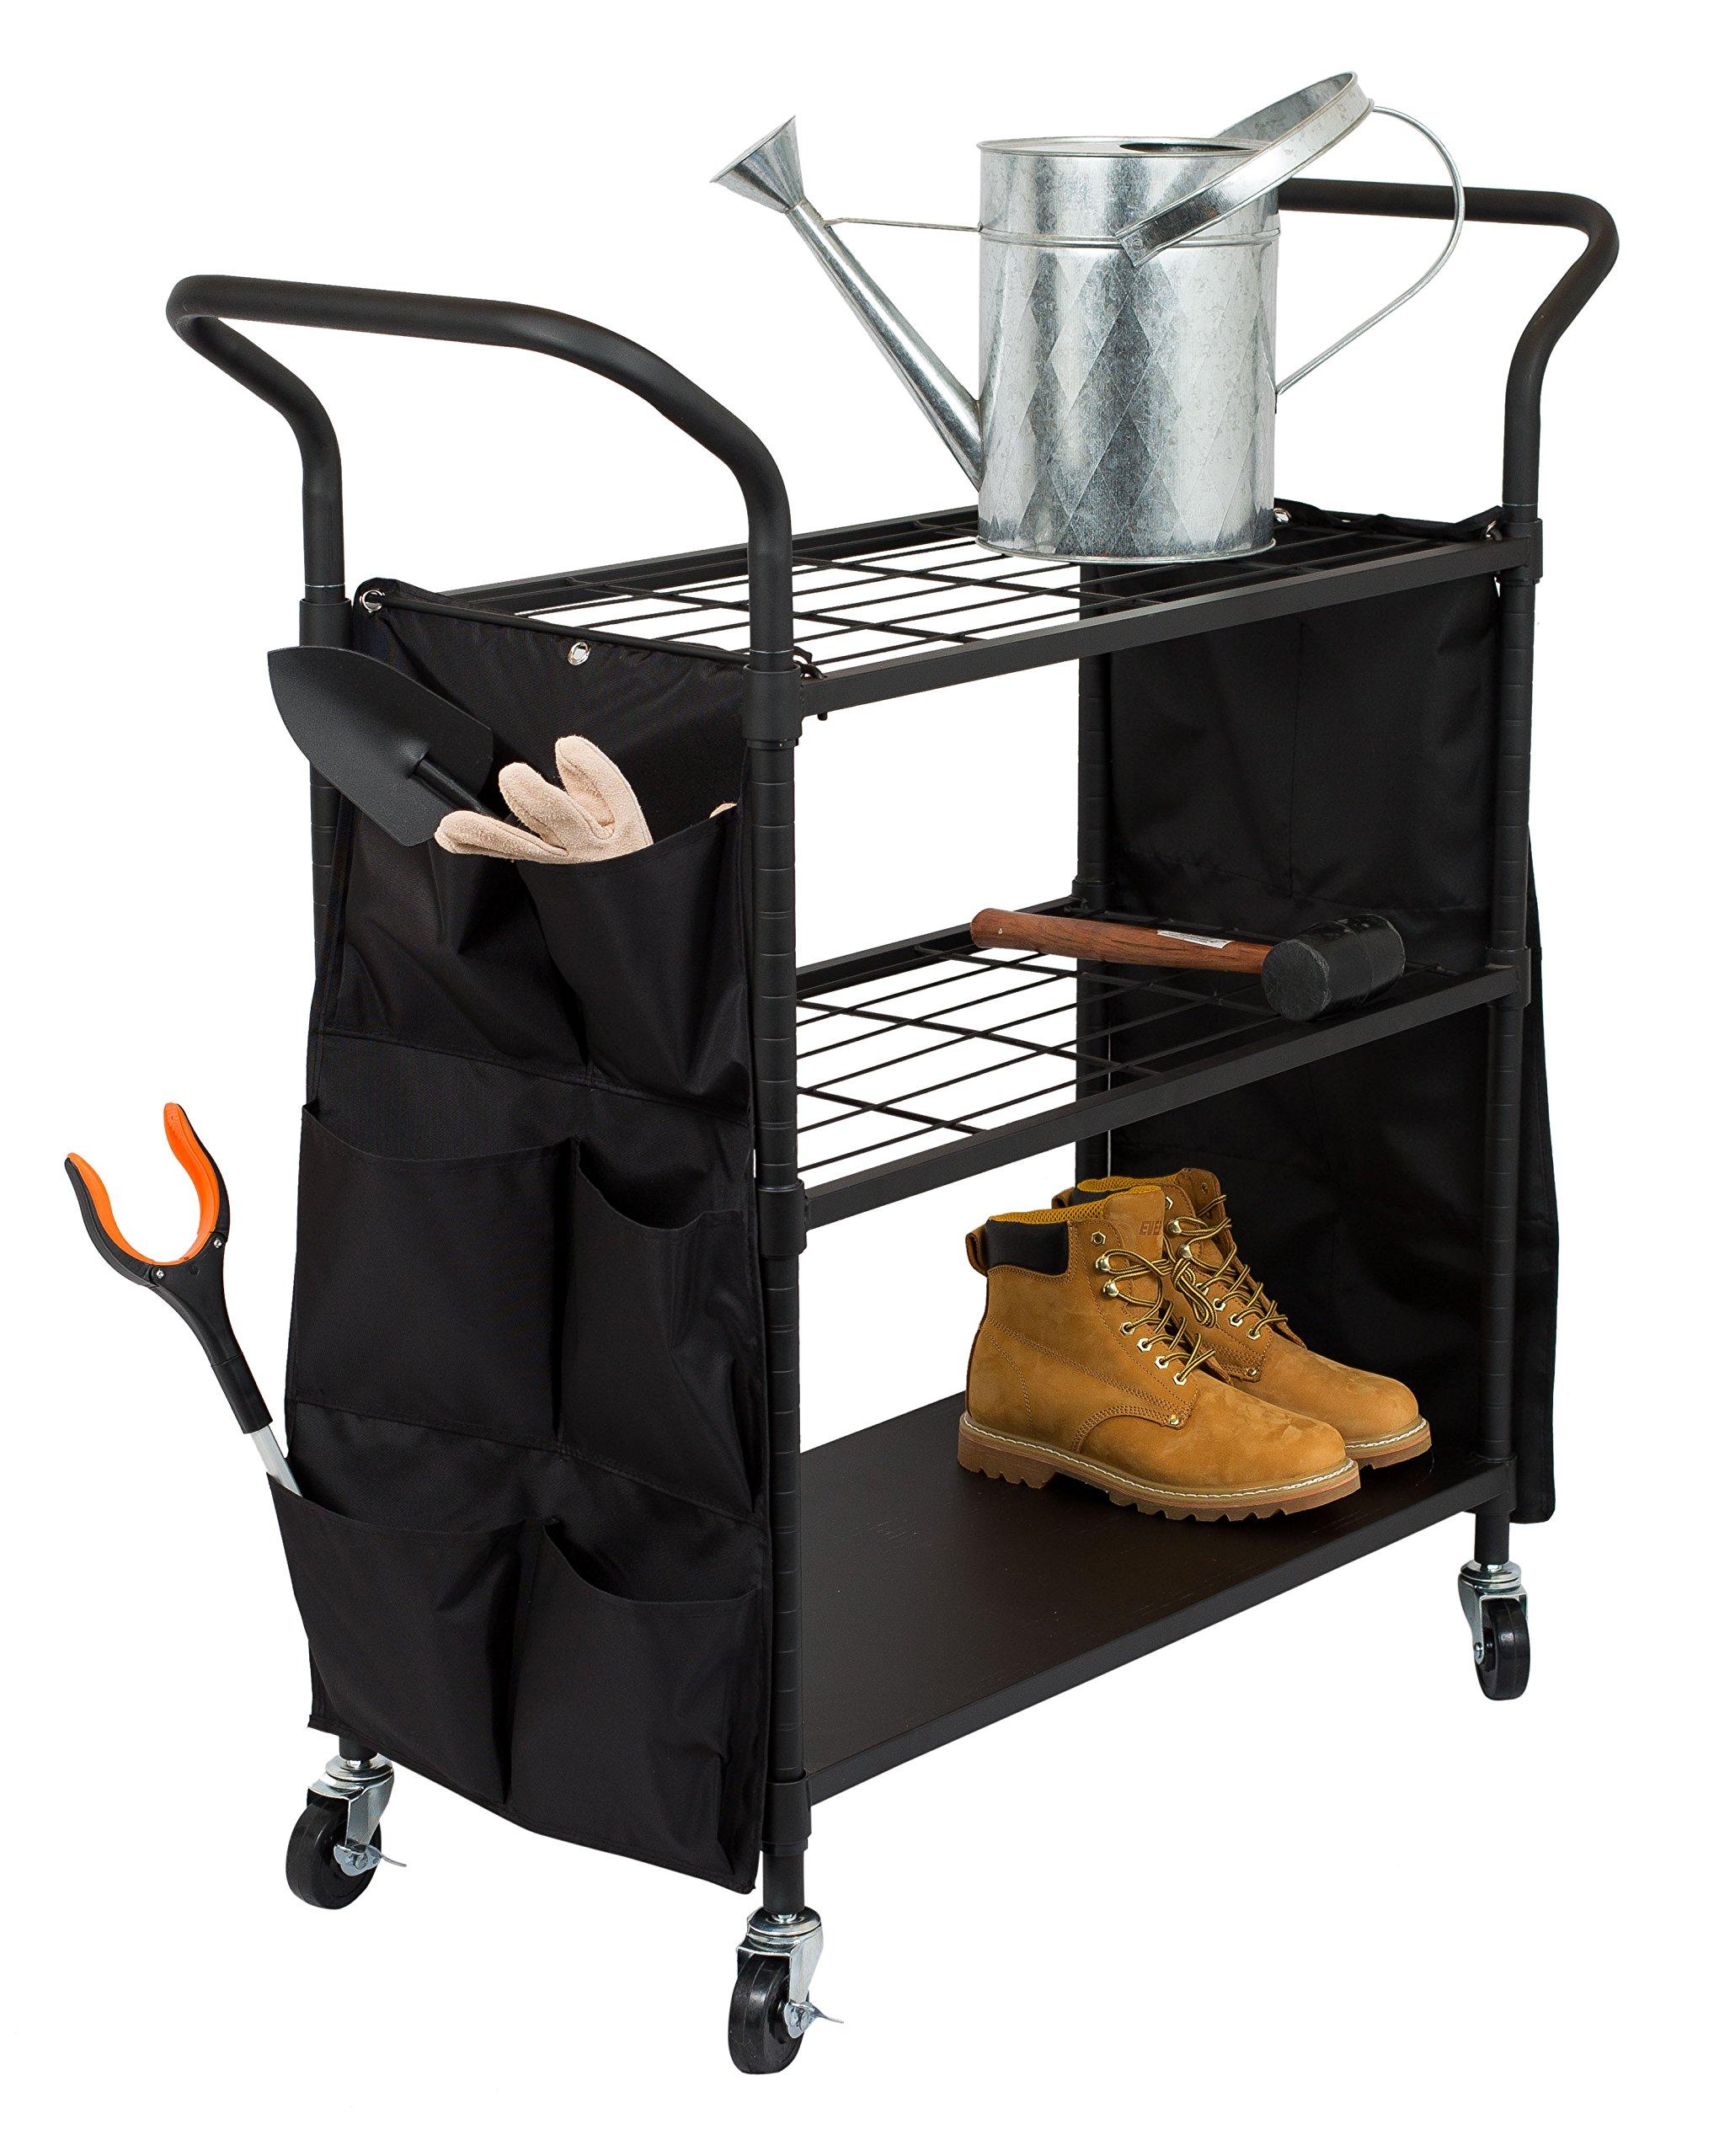 Internet's Best Garden Tool Utility Cart | Flat Black | 3 Tier Shelving Cart with Locking Wheels | Rolling Cart for Garden Garage Office | 12 Storage Pockets